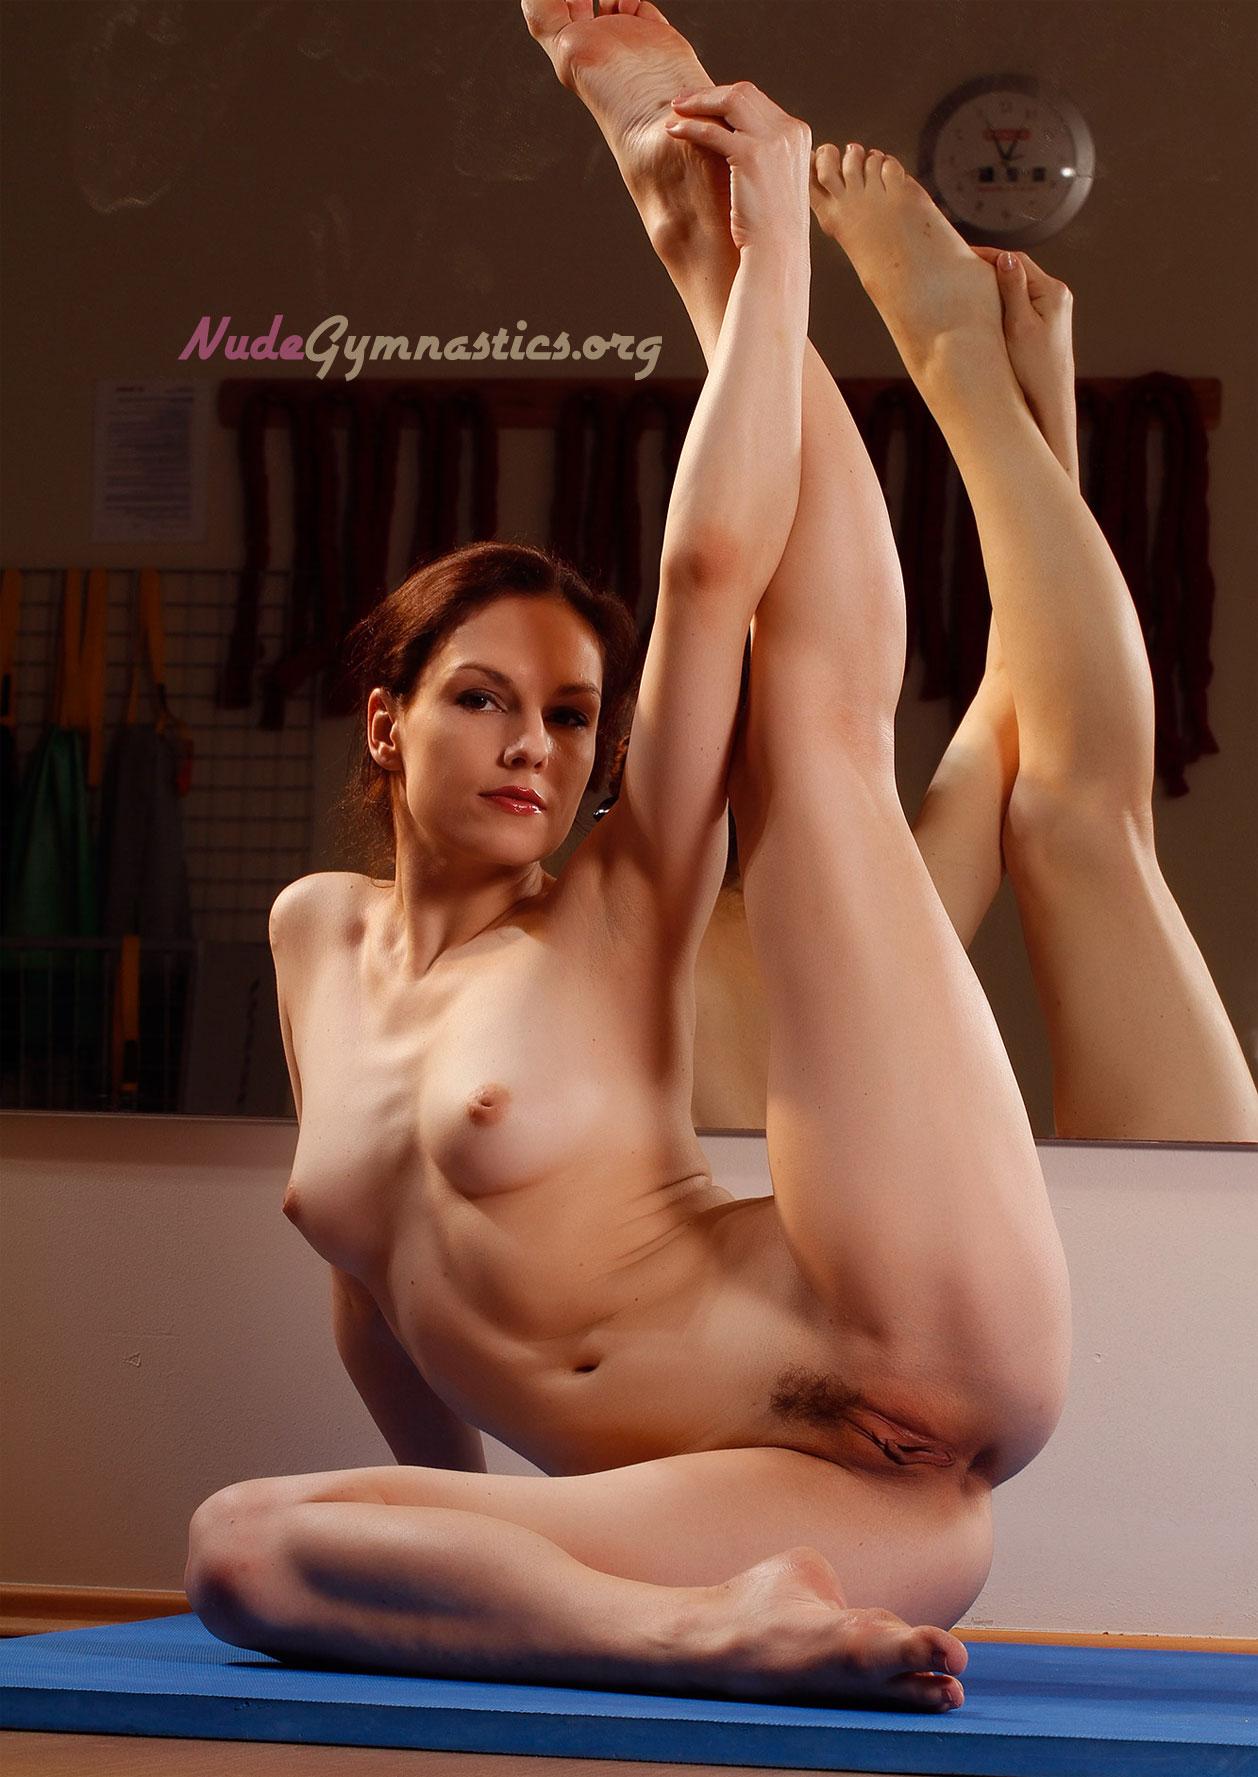 Women gymnastics naked doing